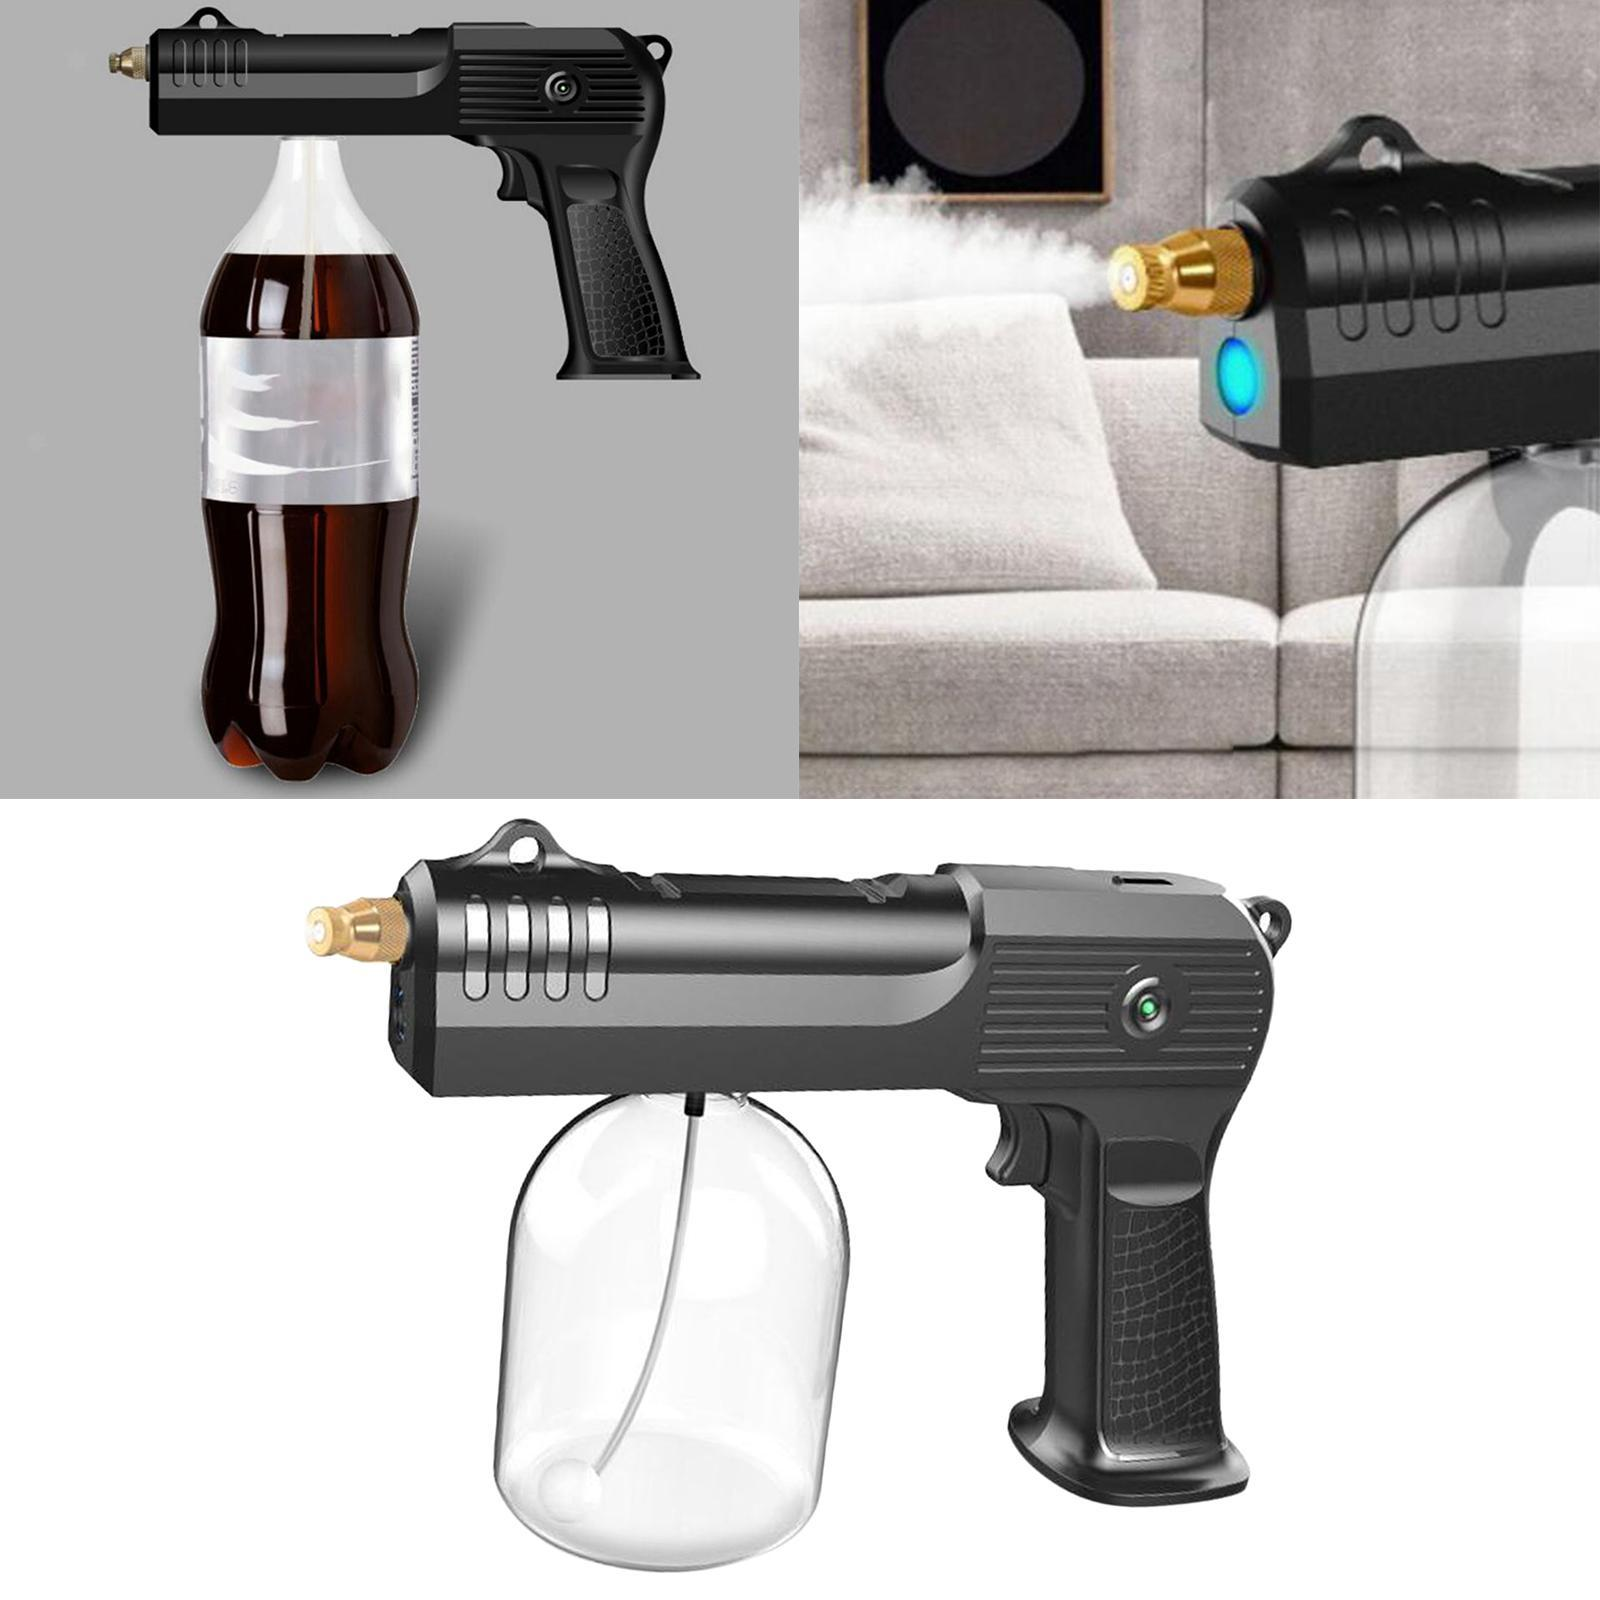 miniature 5 - USB Sanitizer Sprayer 500ml Disinfectant Fogger Mister Spray Gun Portable